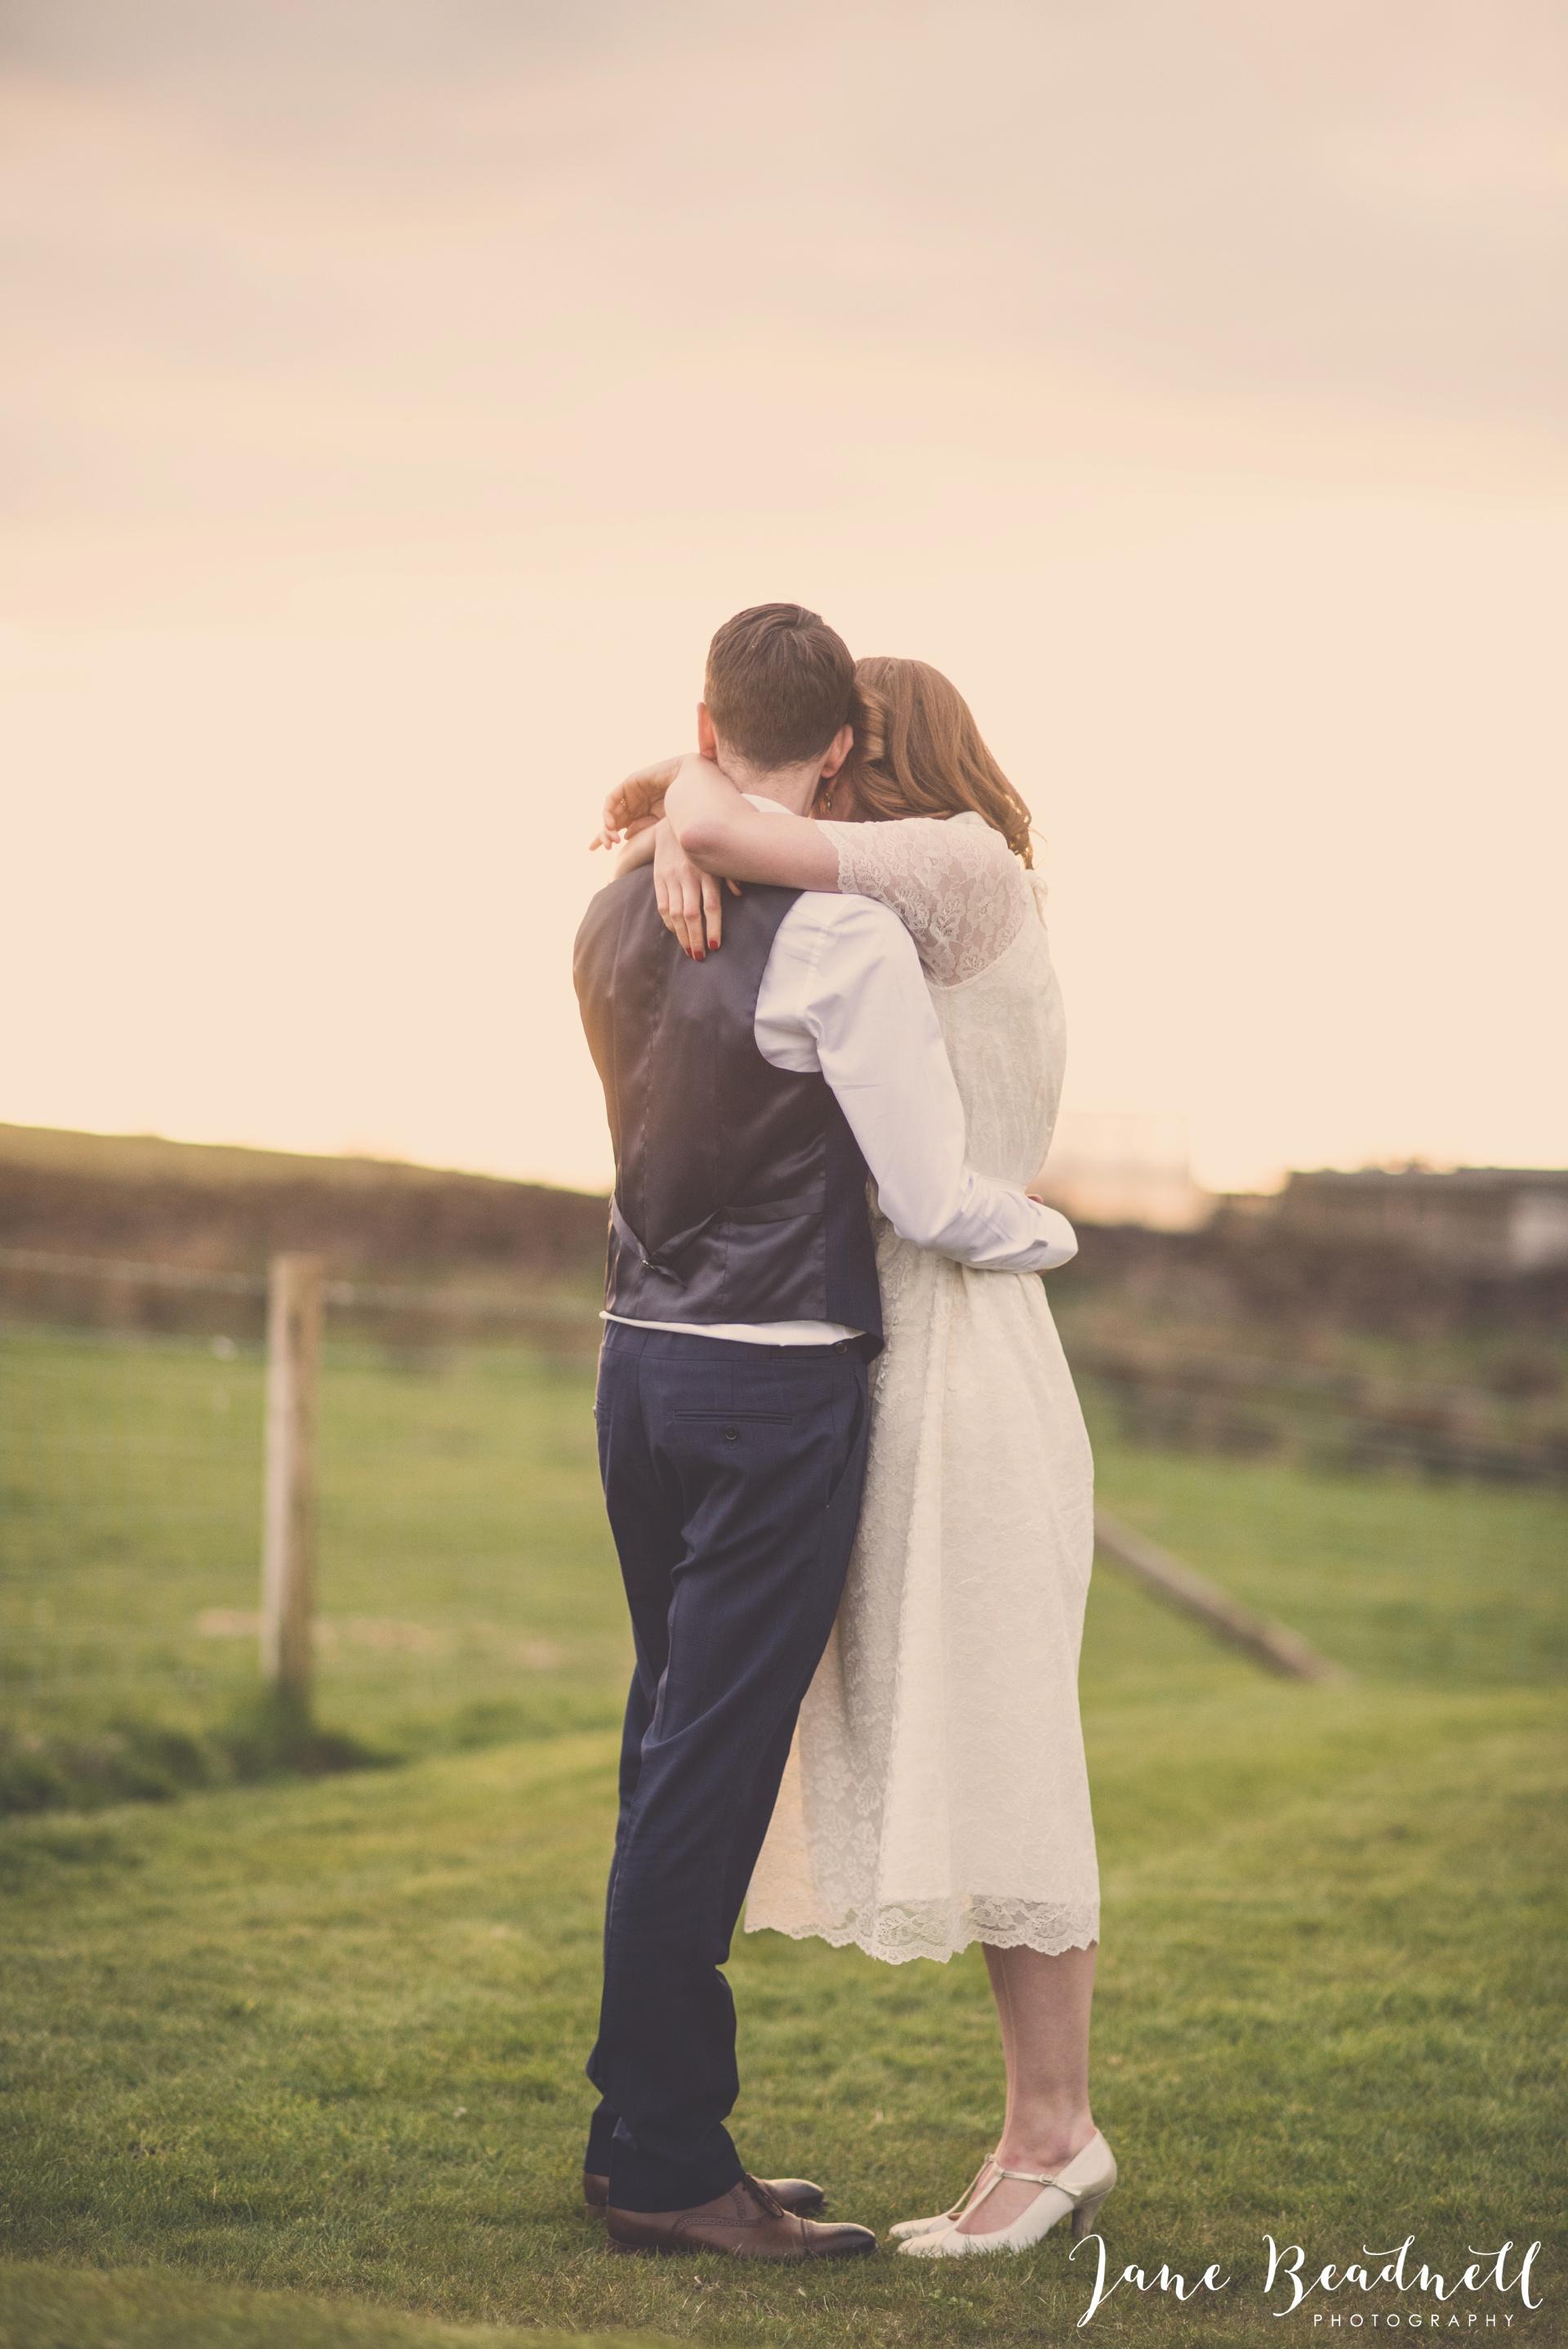 Jane Beadnell fine art wedding photographer The Cheerful Chilli Barn Otley_0044